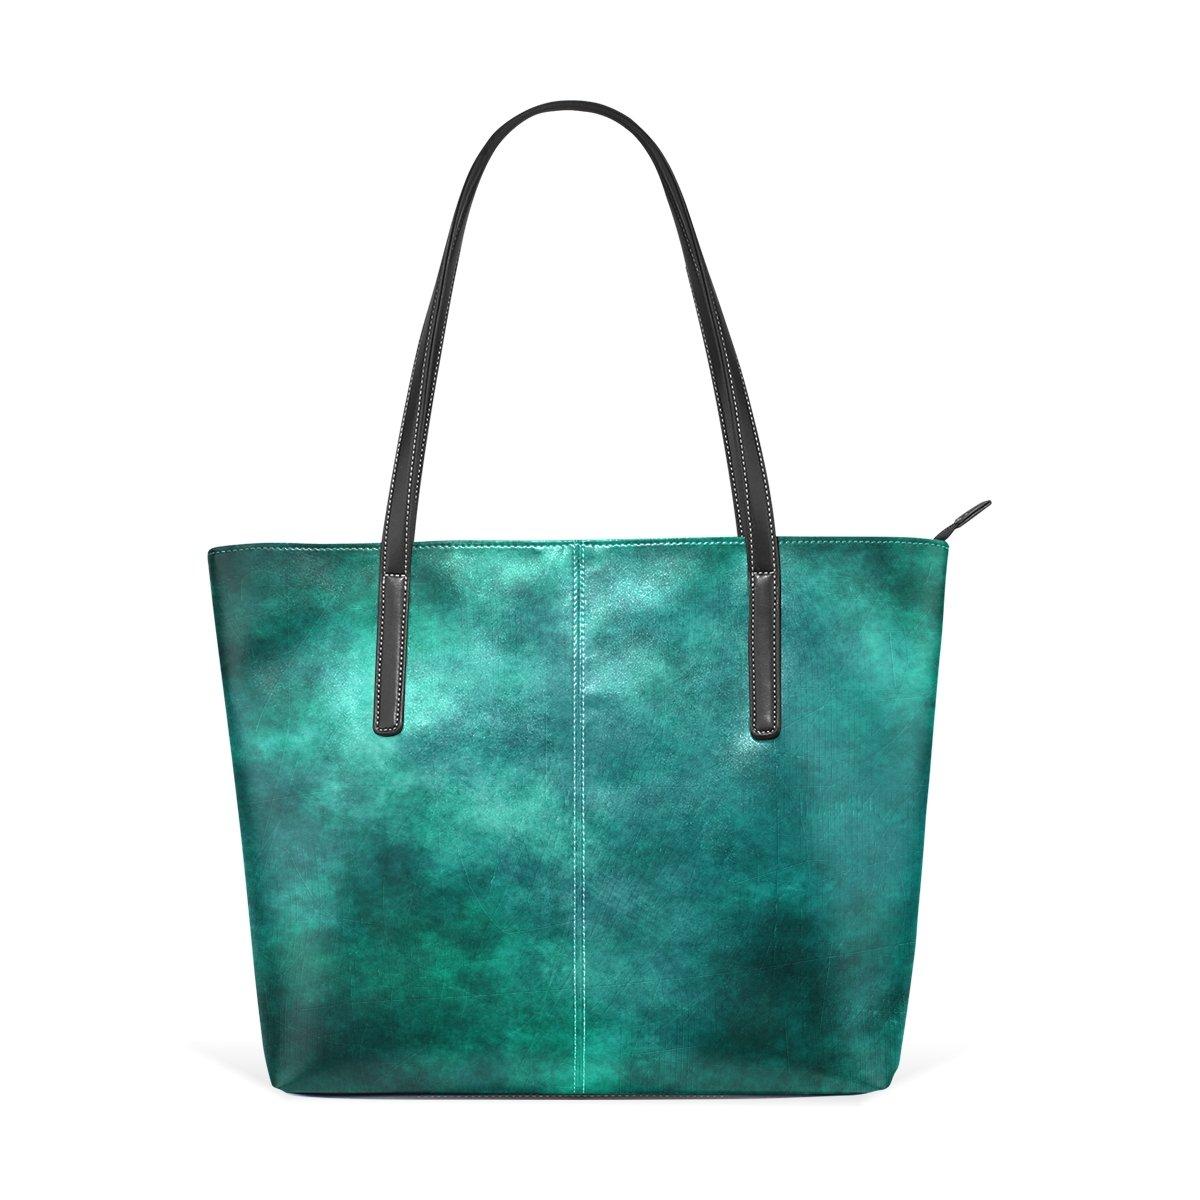 Womens Leather Top Handle Shoulder Handbag Art Sky Large Work Tote Bag